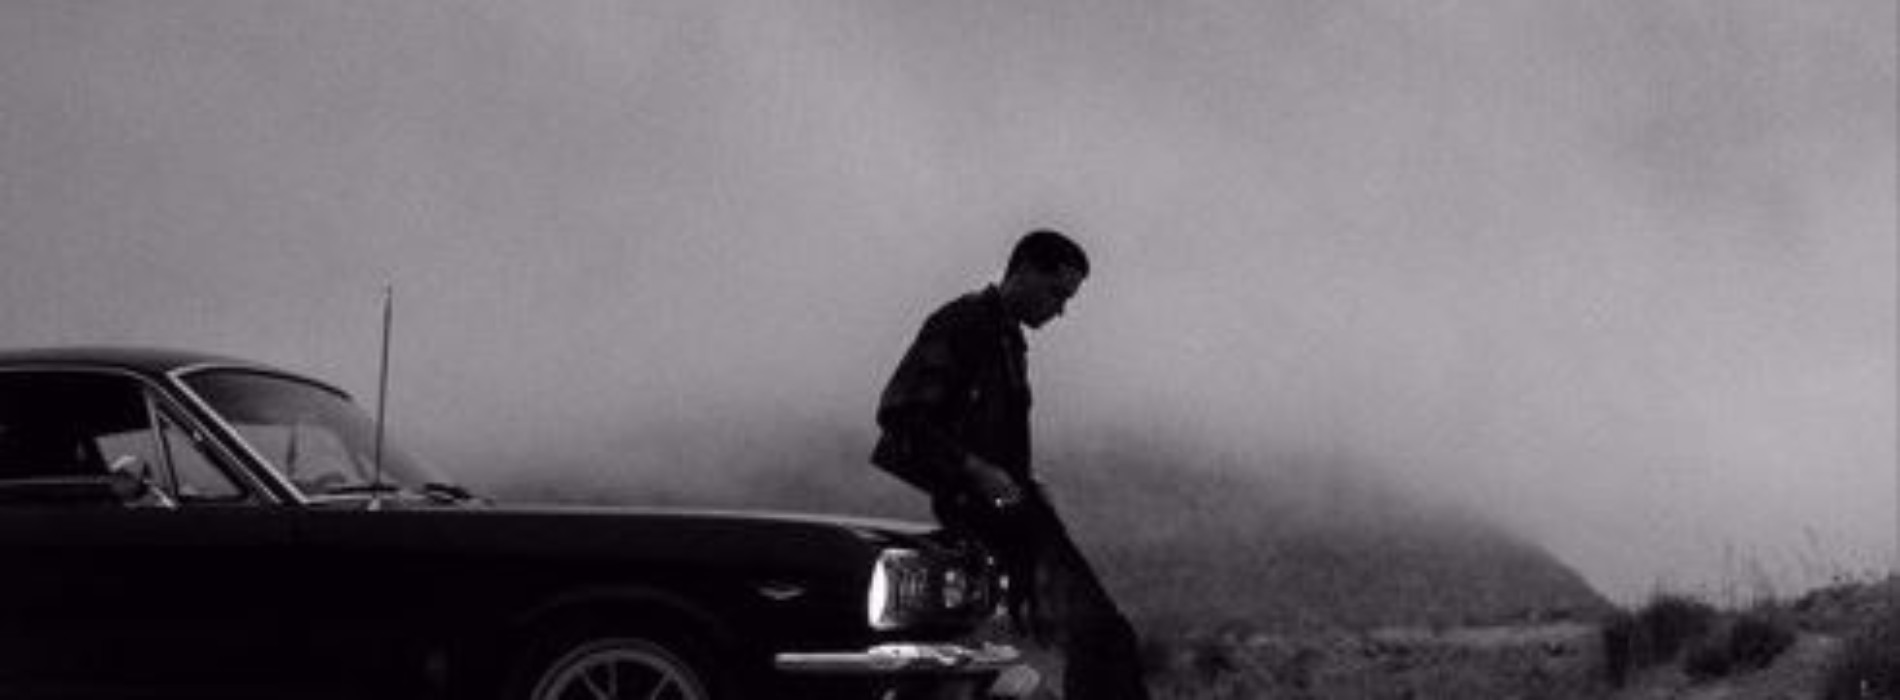 G-Eazy – The Beautiful & Damned (Dropwizz Remix)